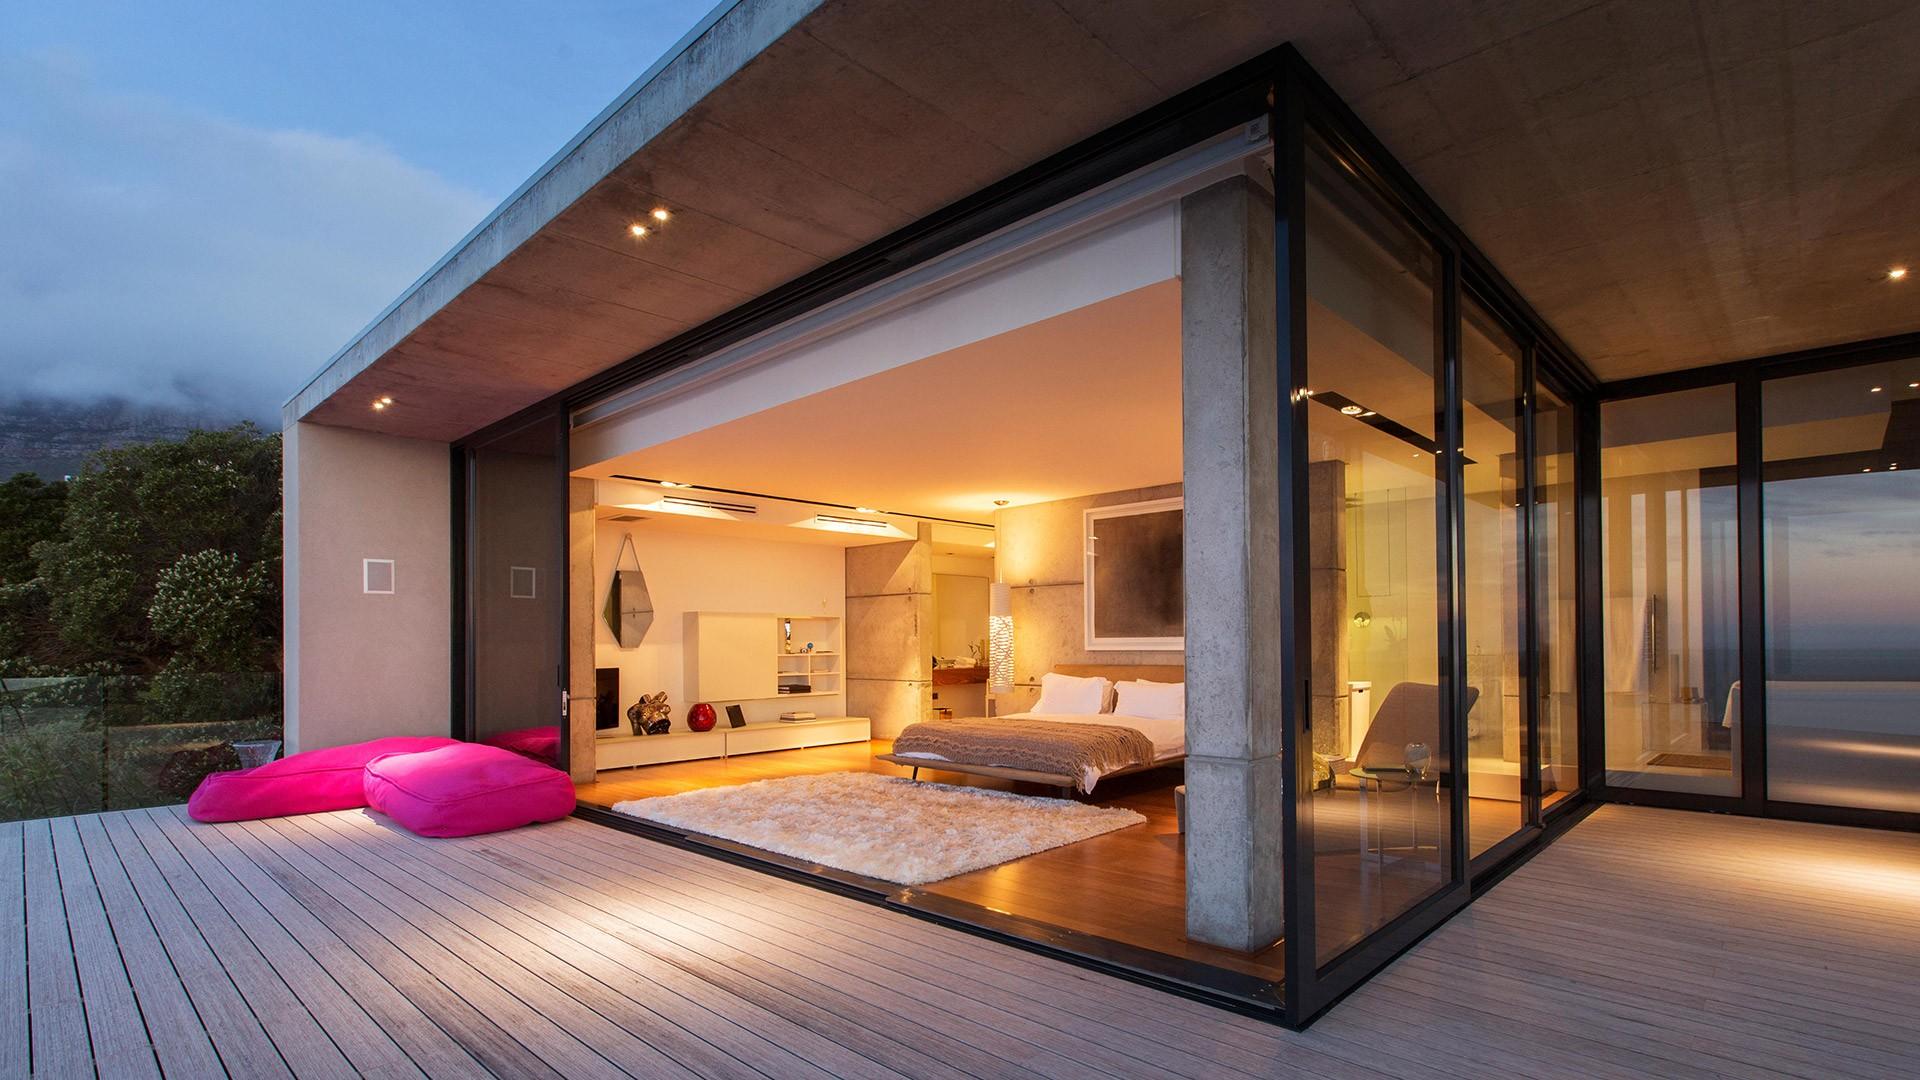 france fermetures fabricant de portes de garage volets persiennes. Black Bedroom Furniture Sets. Home Design Ideas